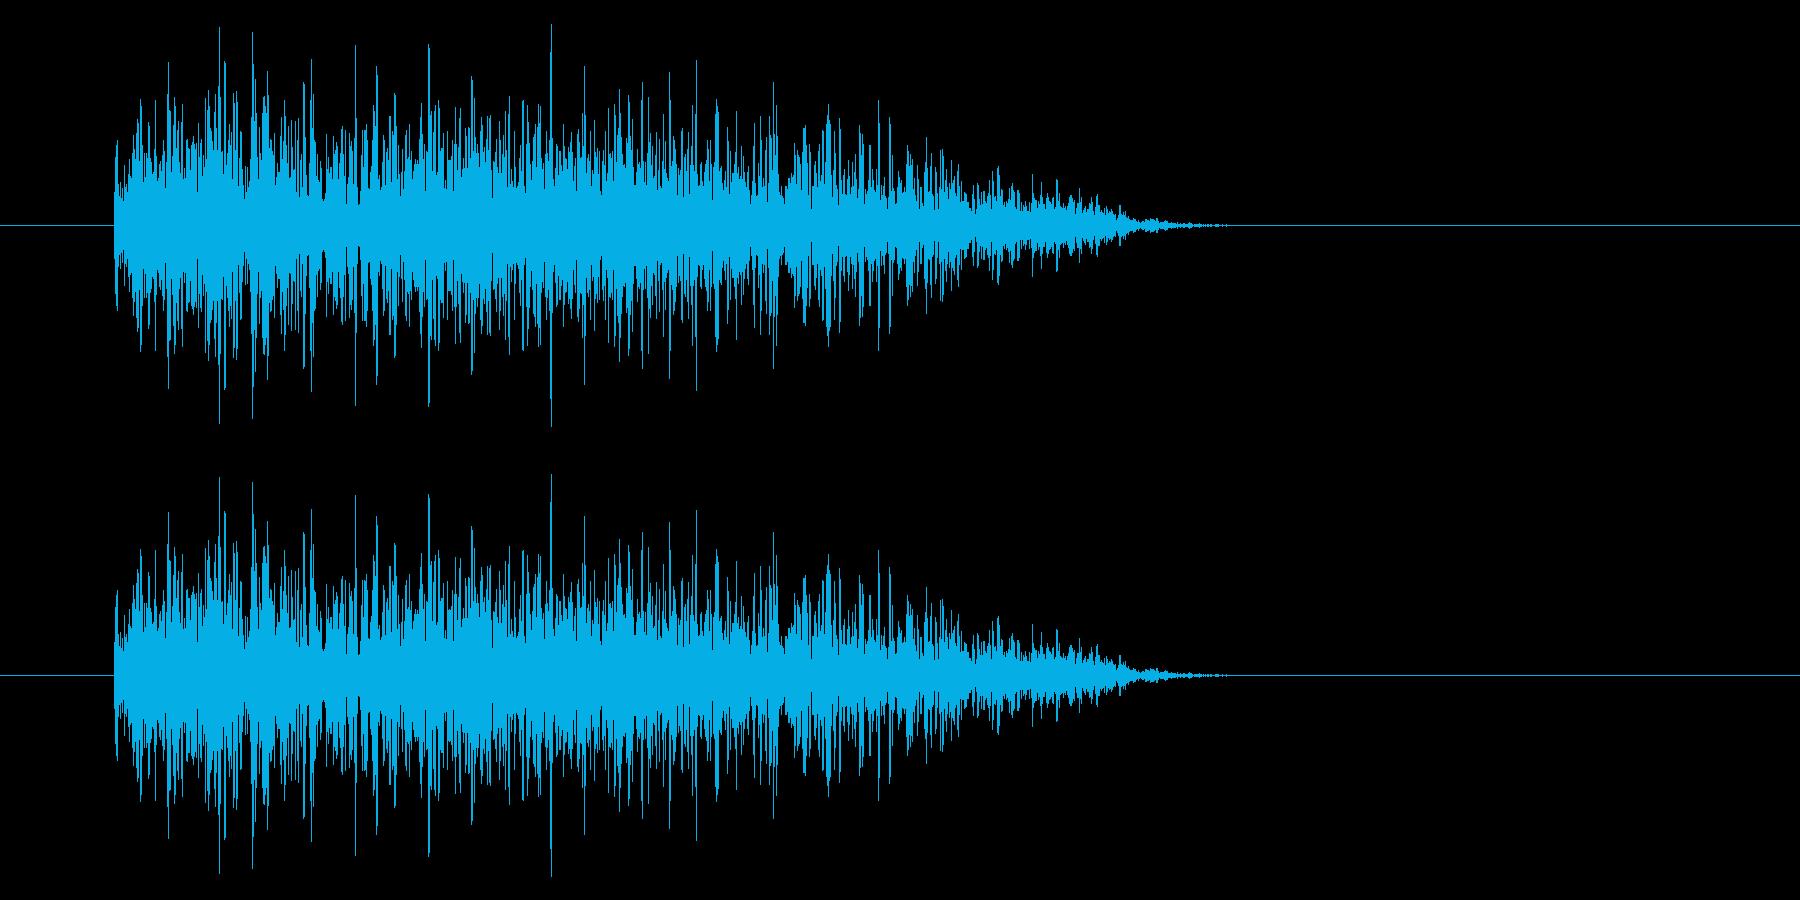 SNES-RPG04-02(魔法 炎1)の再生済みの波形